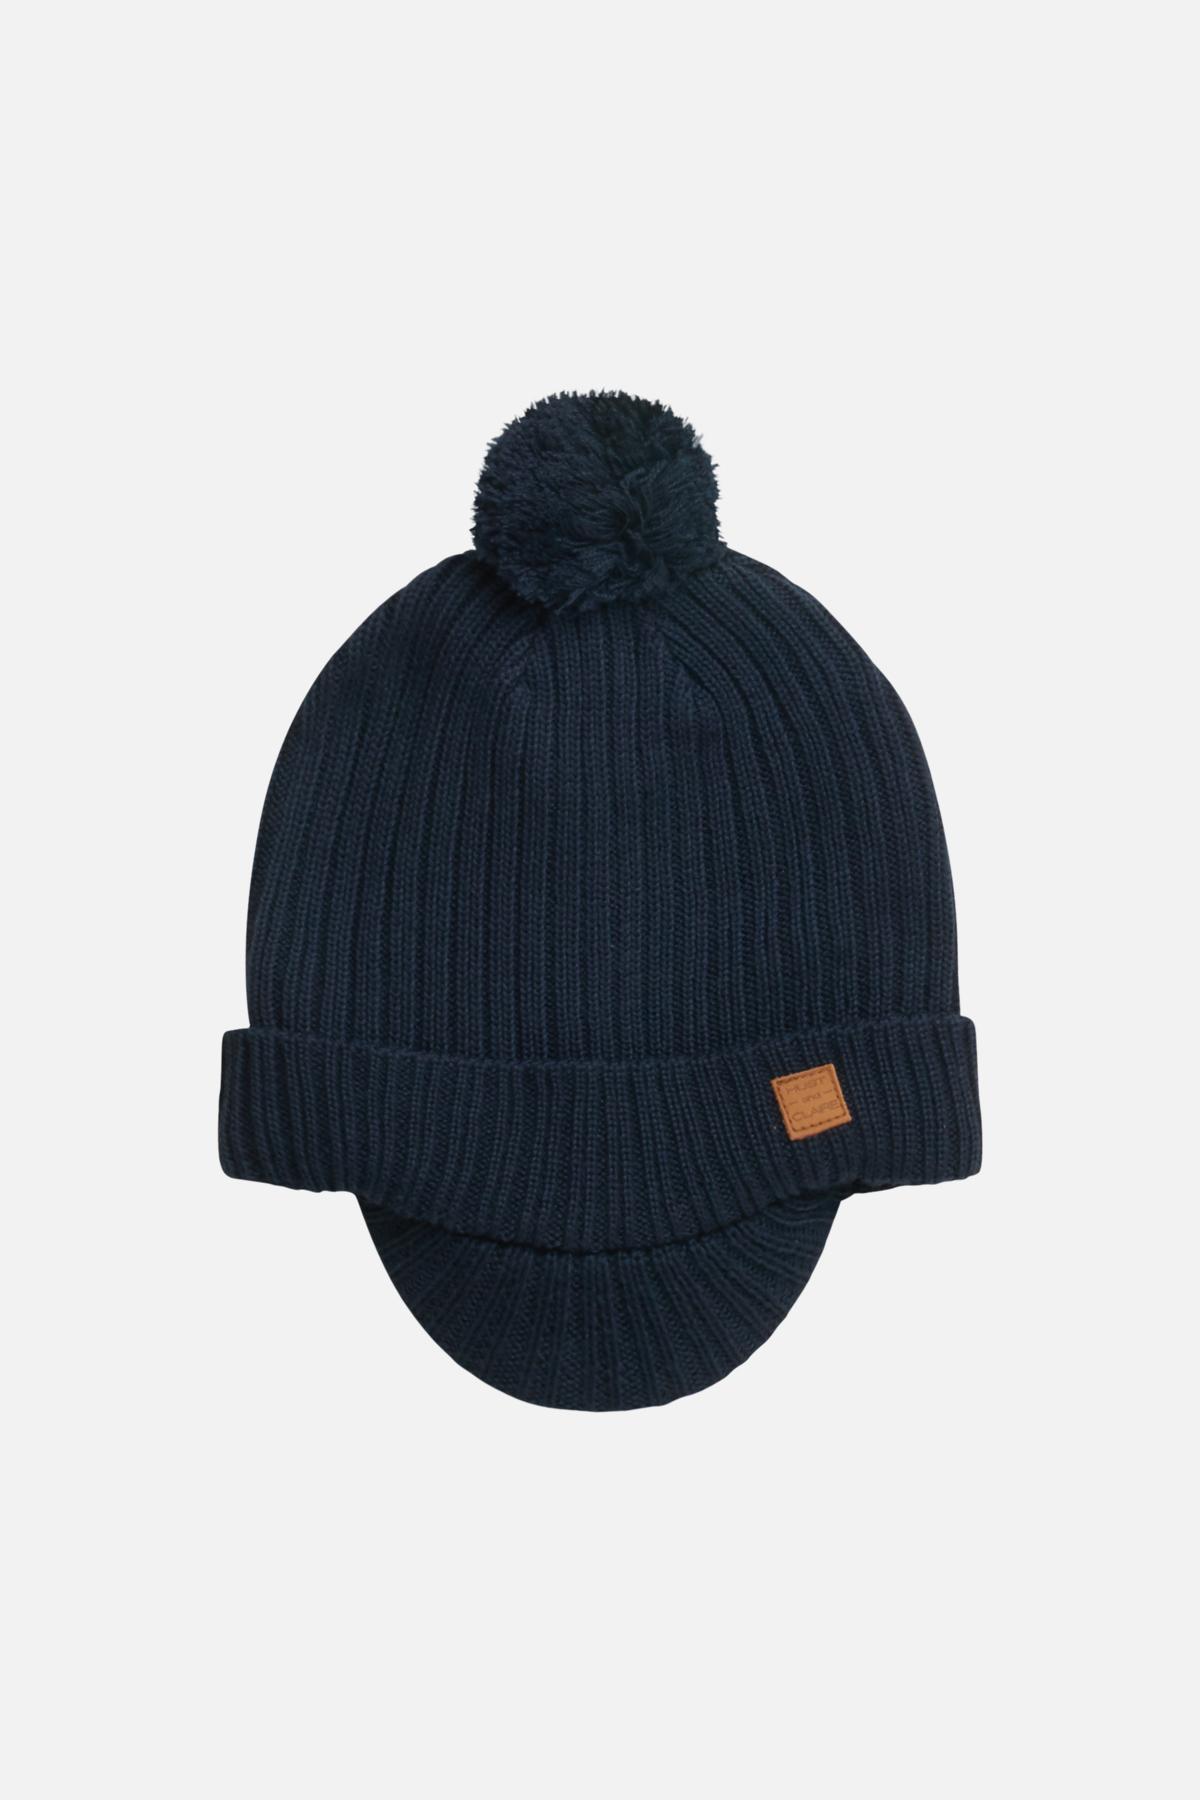 Uni - Flemming - Hat